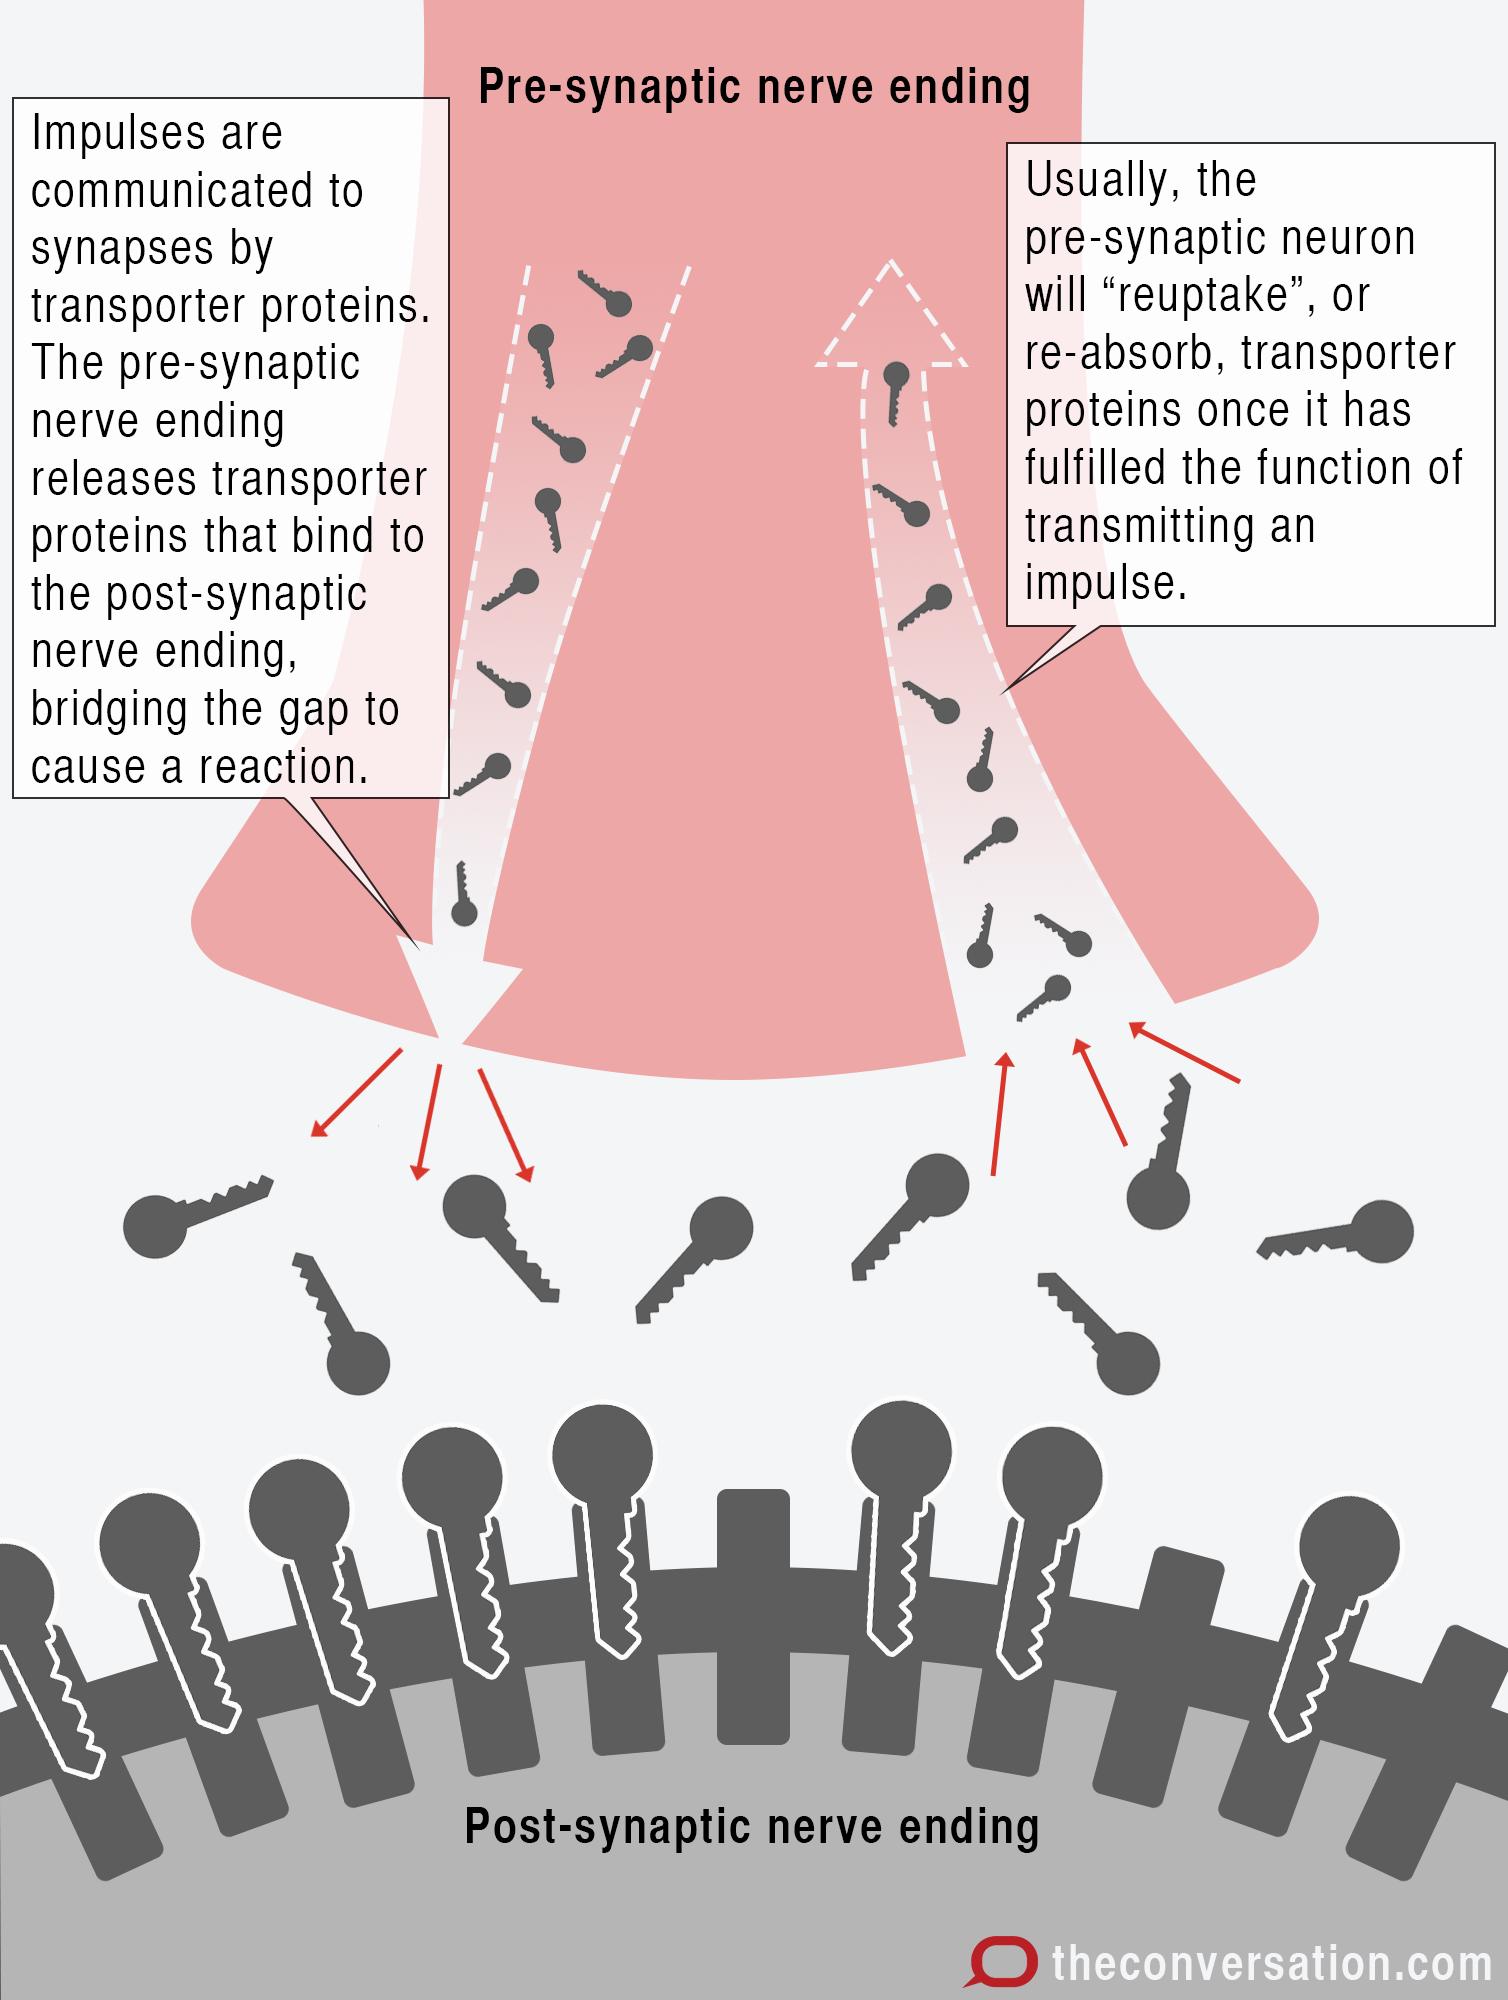 Membrane transport inhibitors